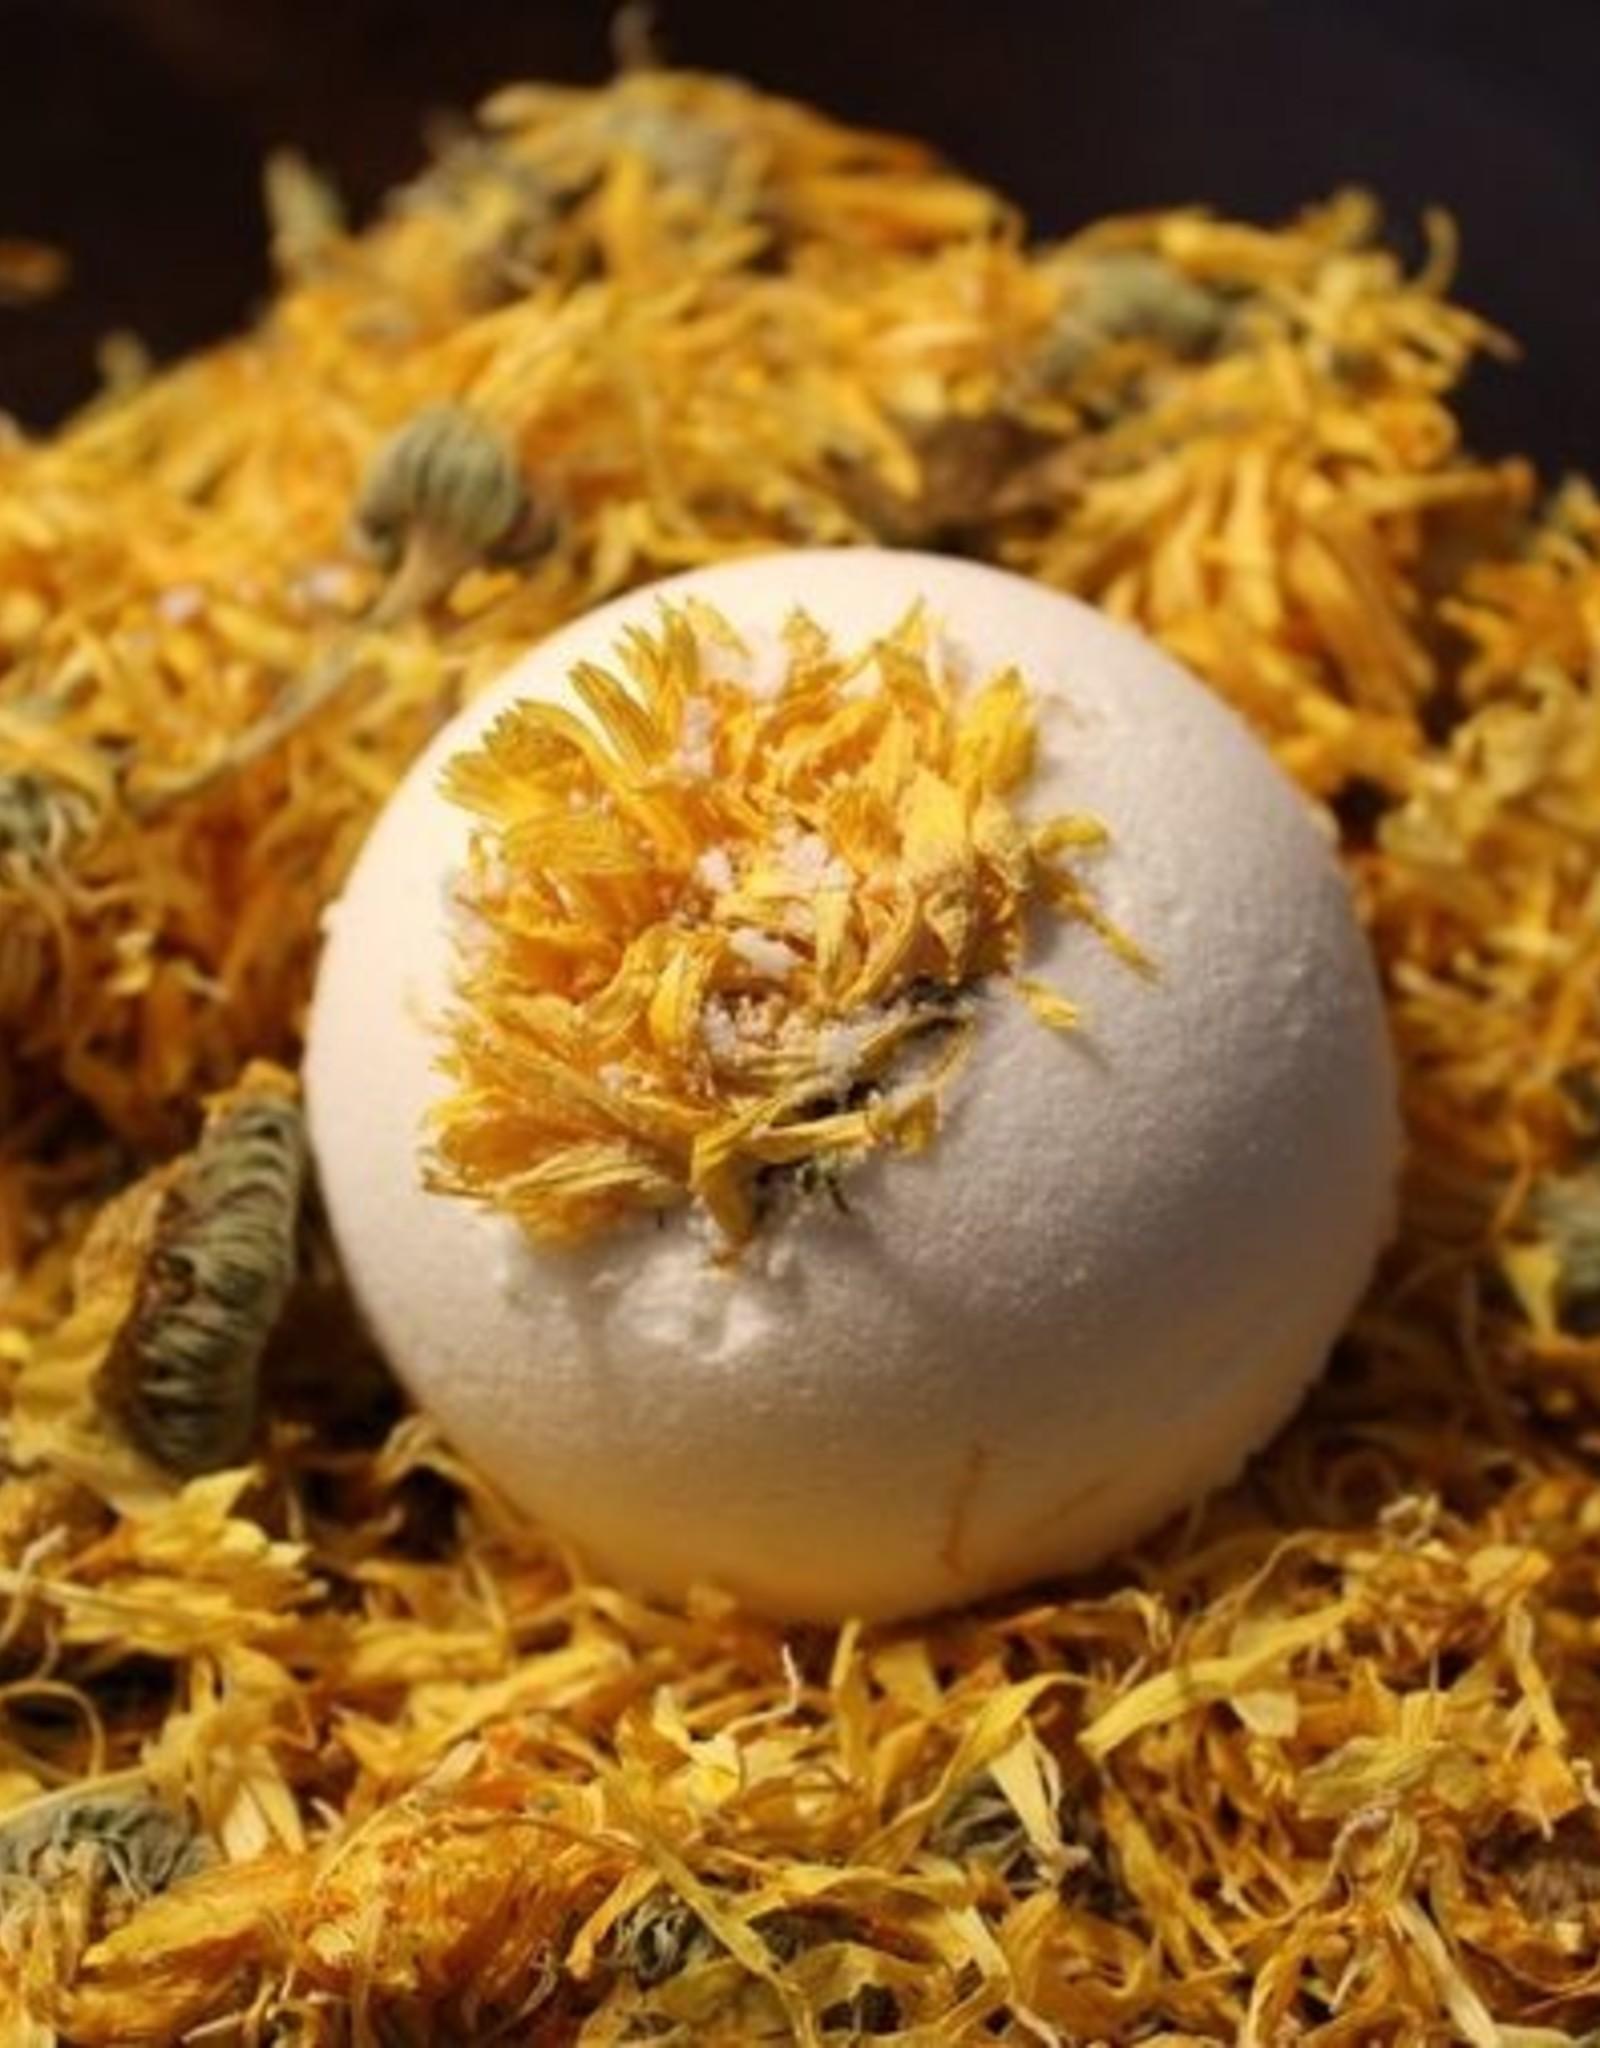 Butter Me Up Organics Organic Bath Bomb - Sick